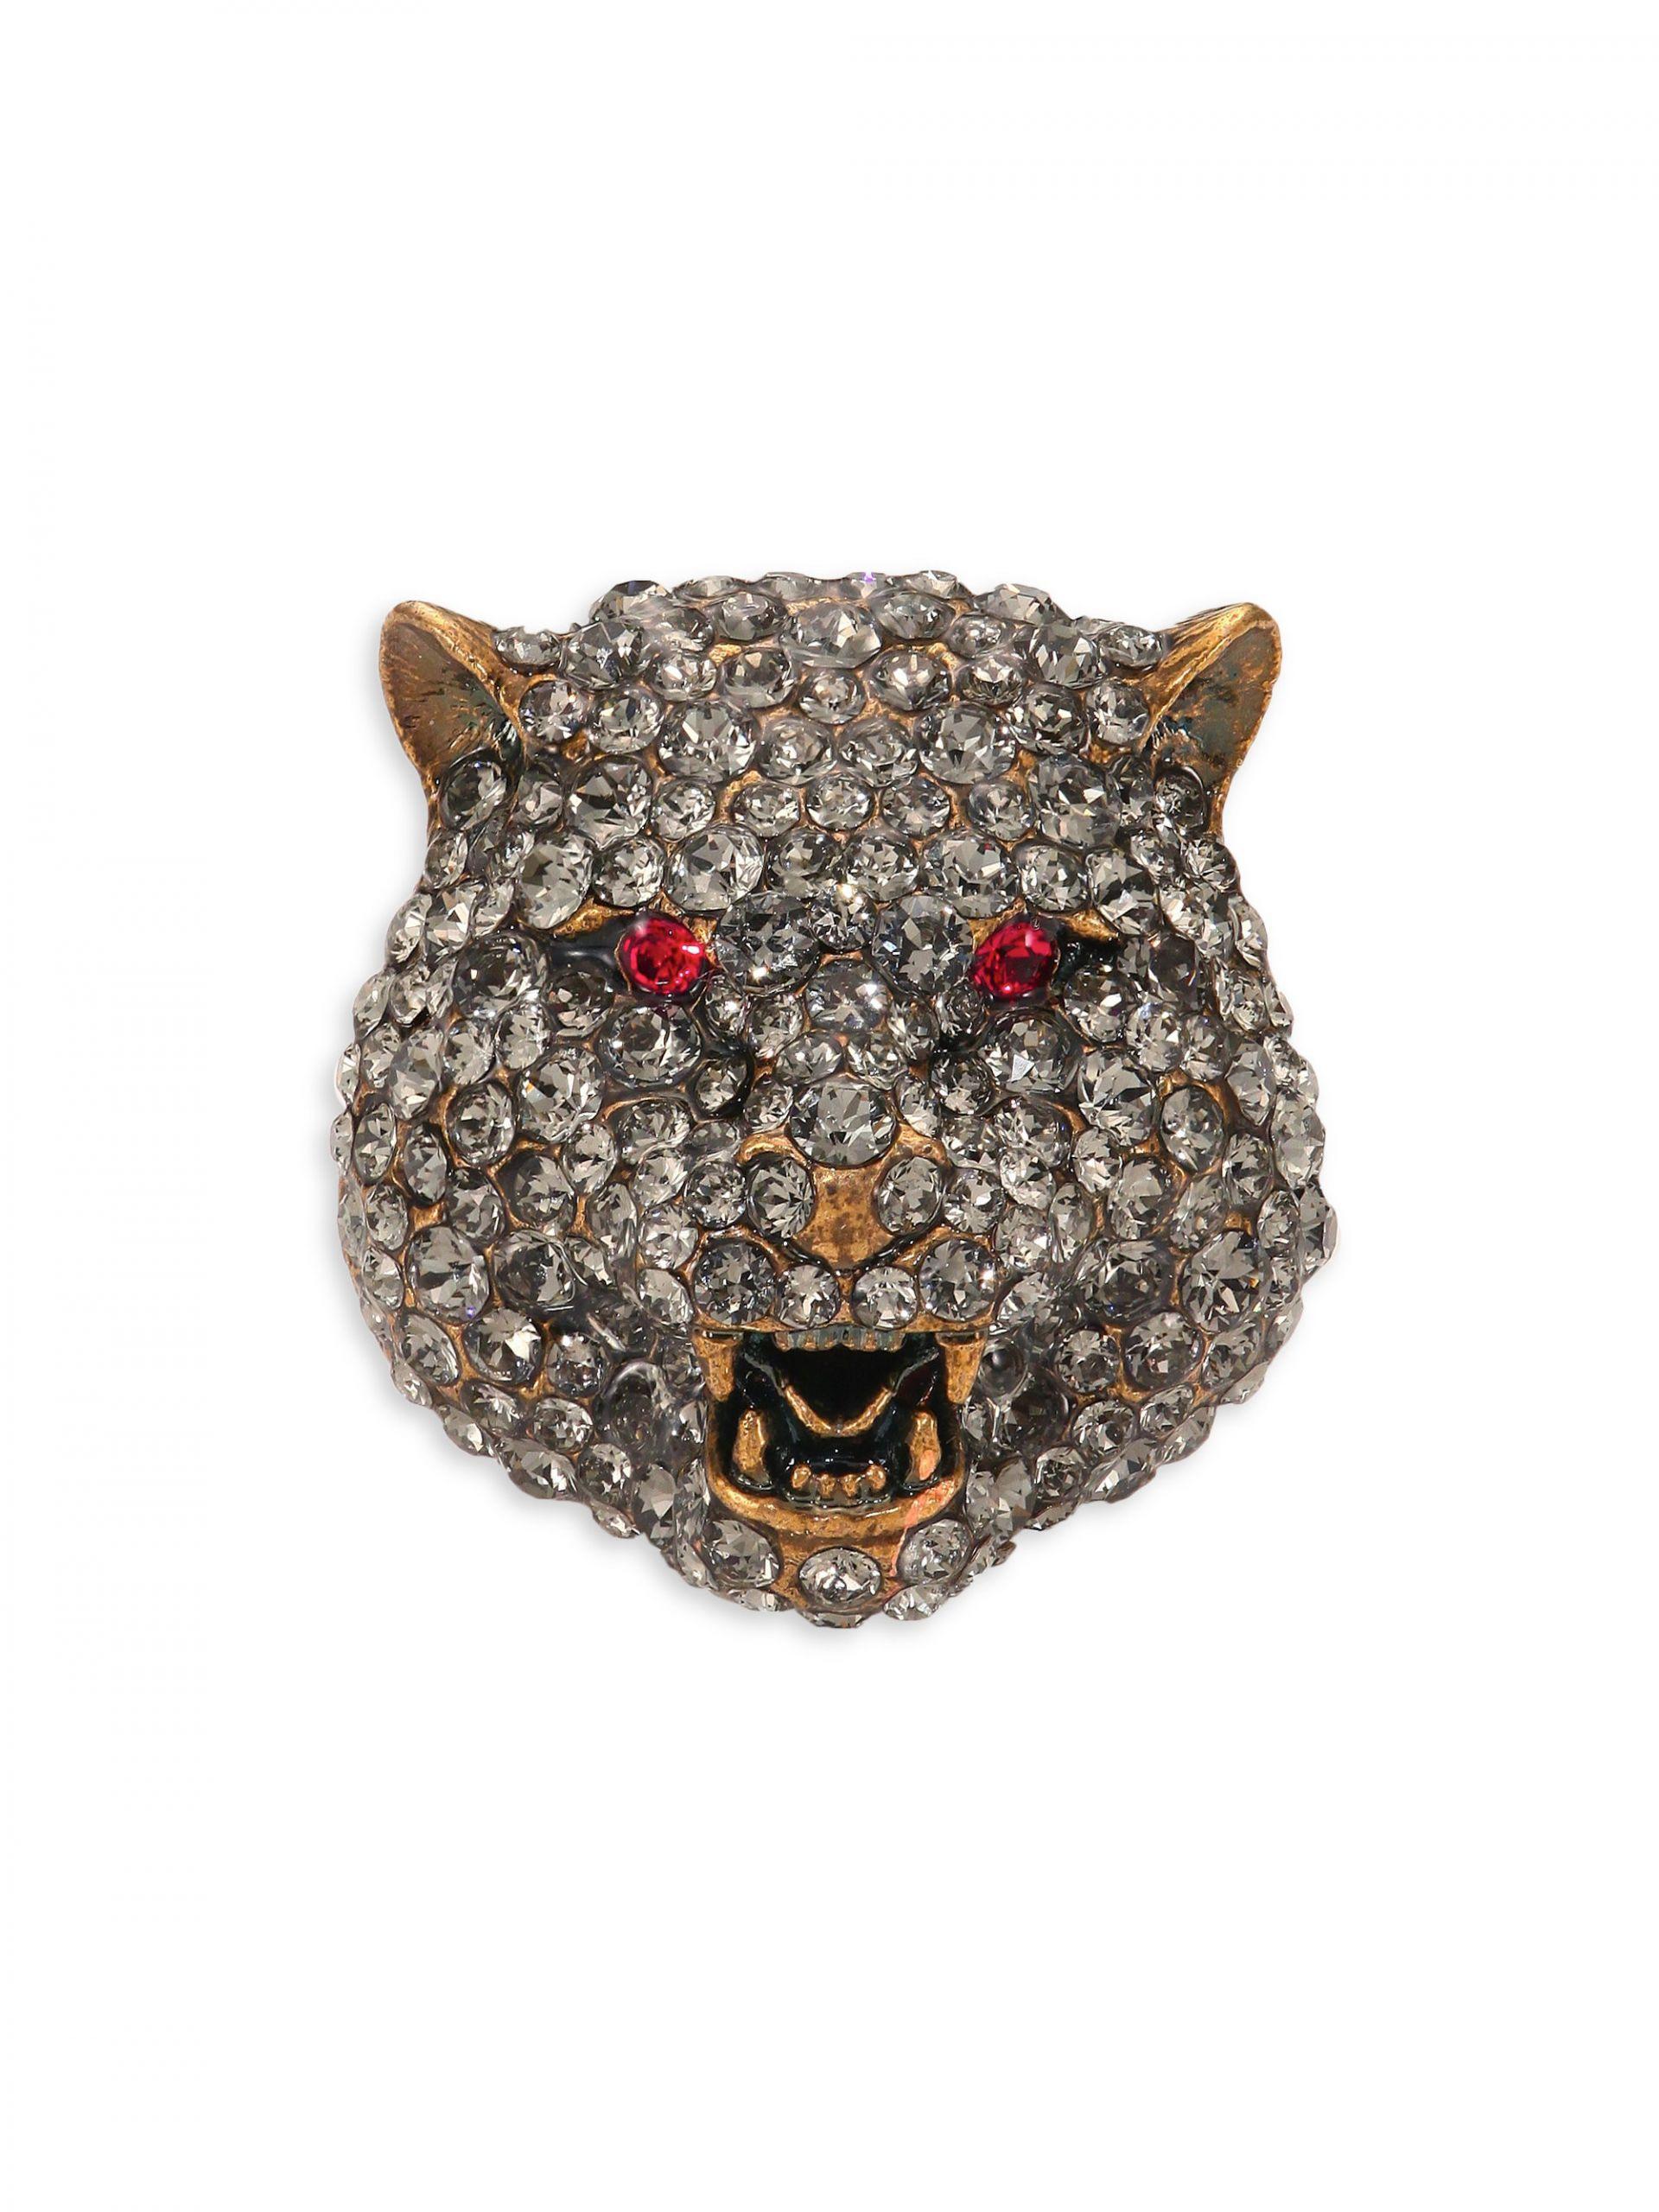 Gucci Brooches  Gucci Feline Crystal Brooch in Metallic